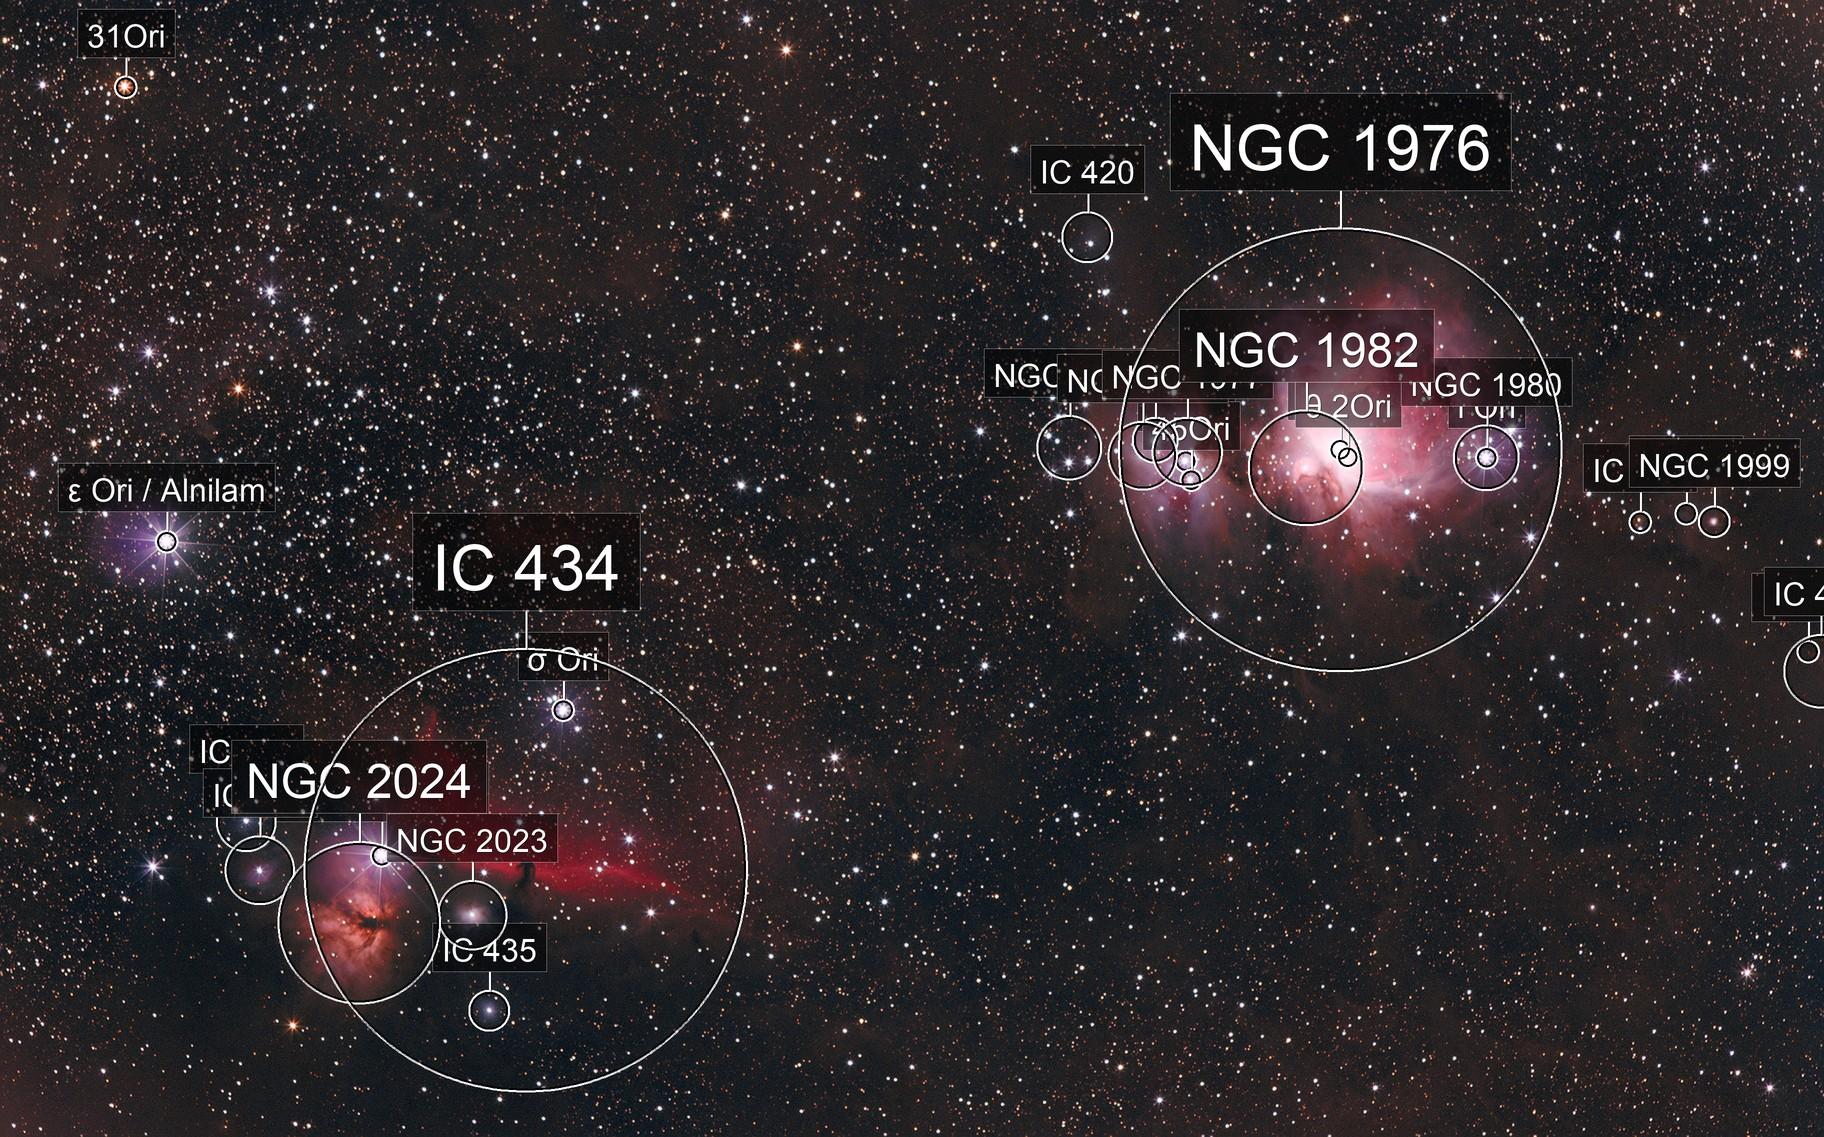 M42 & NGC 2024 & IC 434